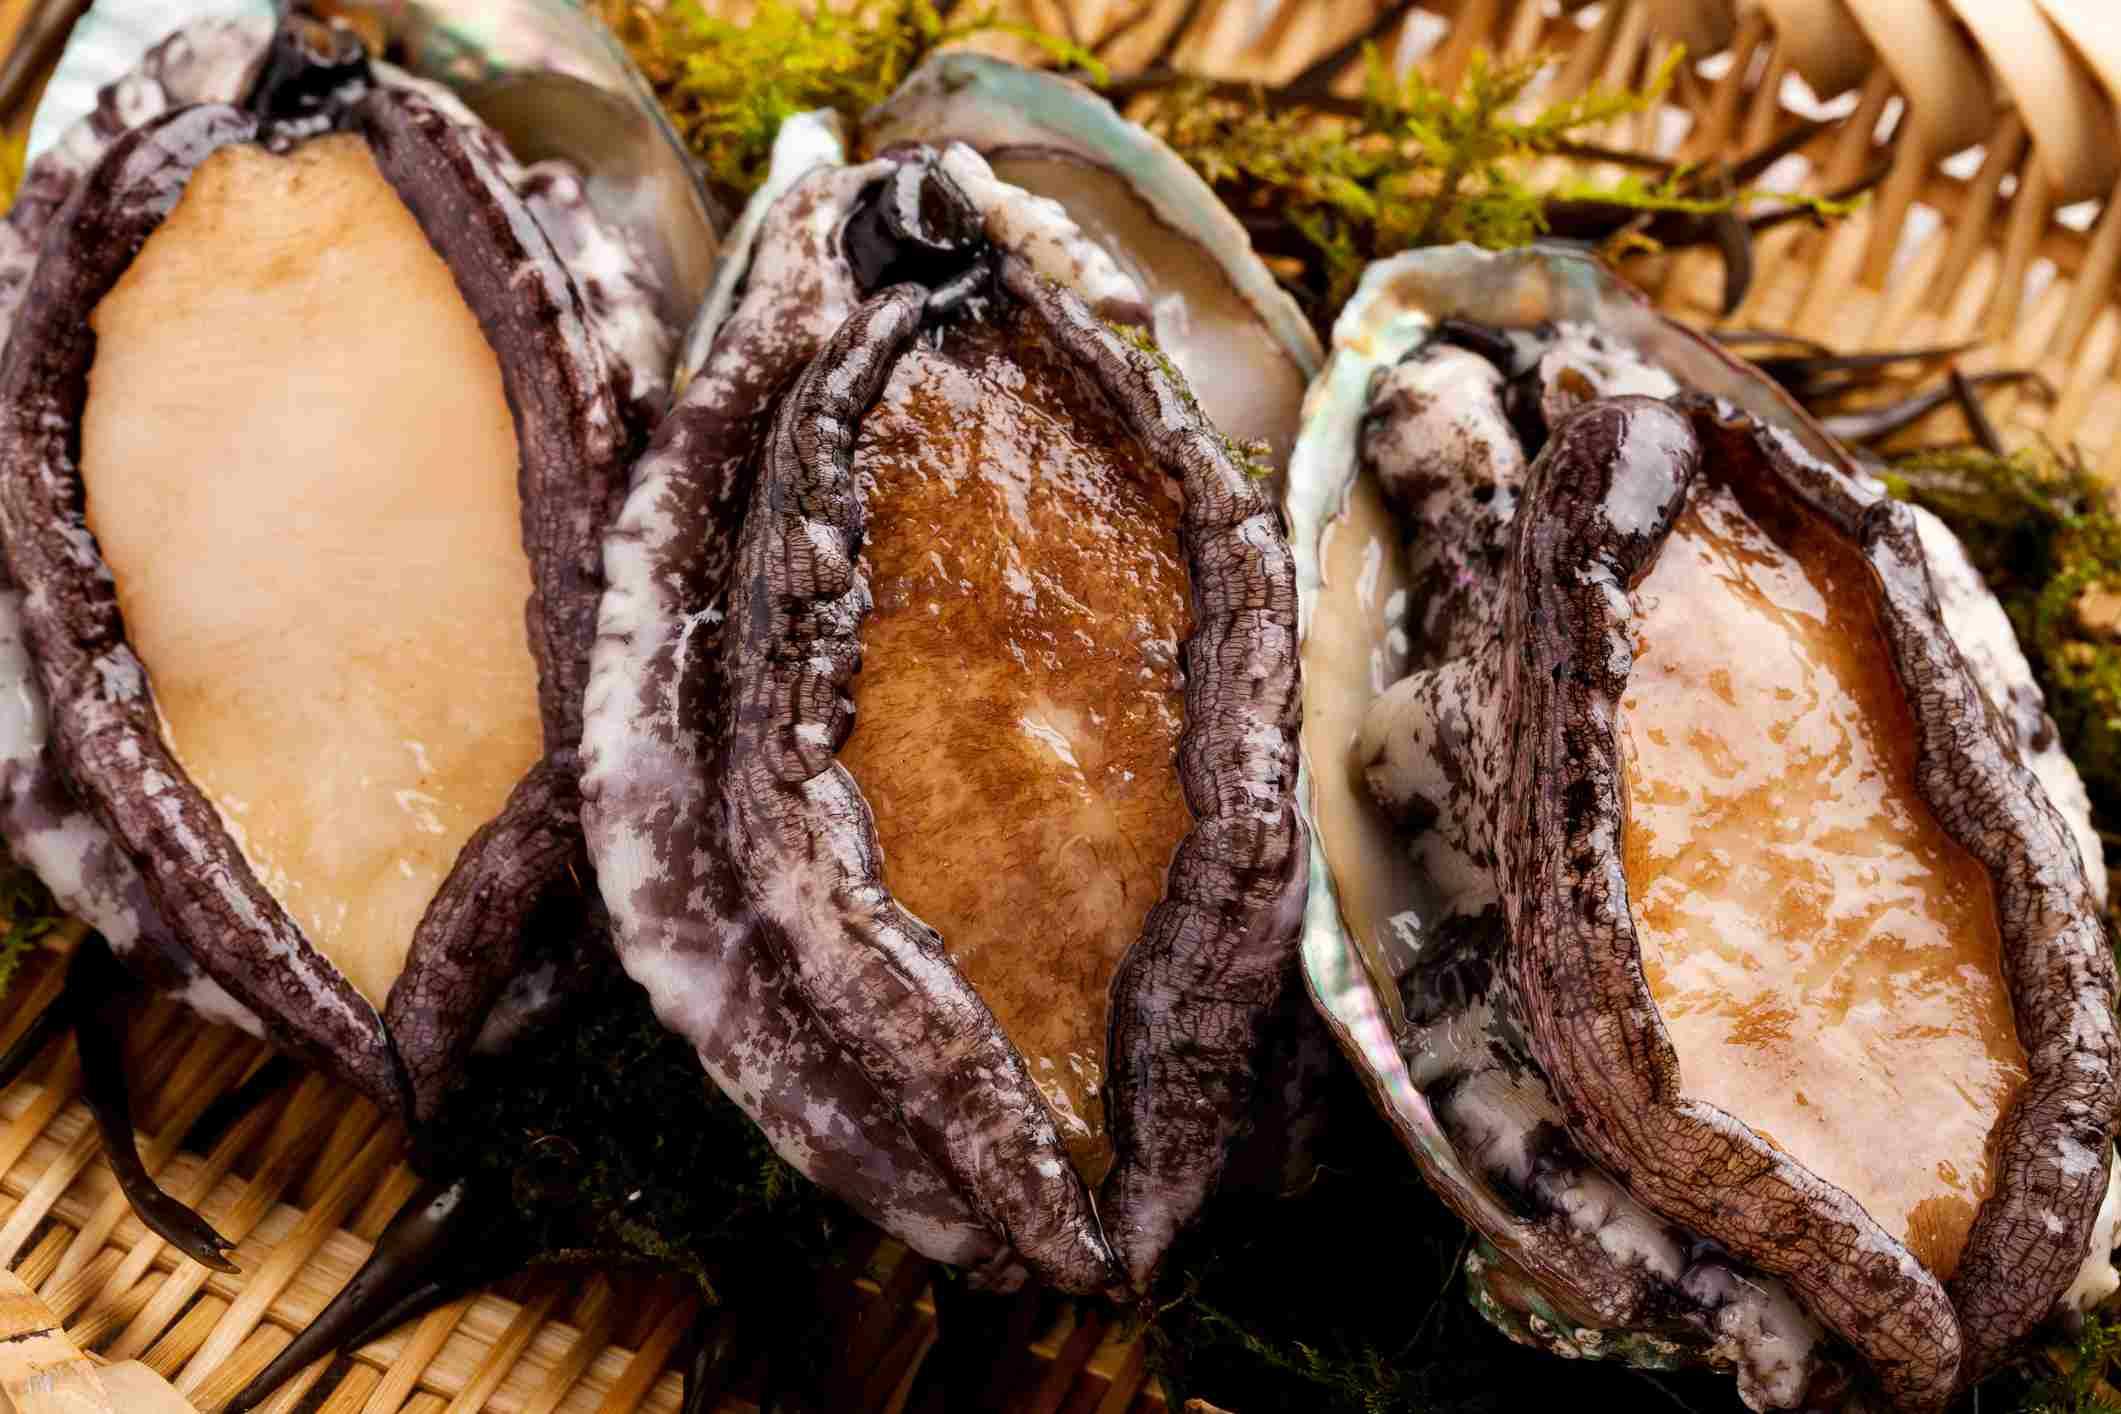 Fresh abalone clams